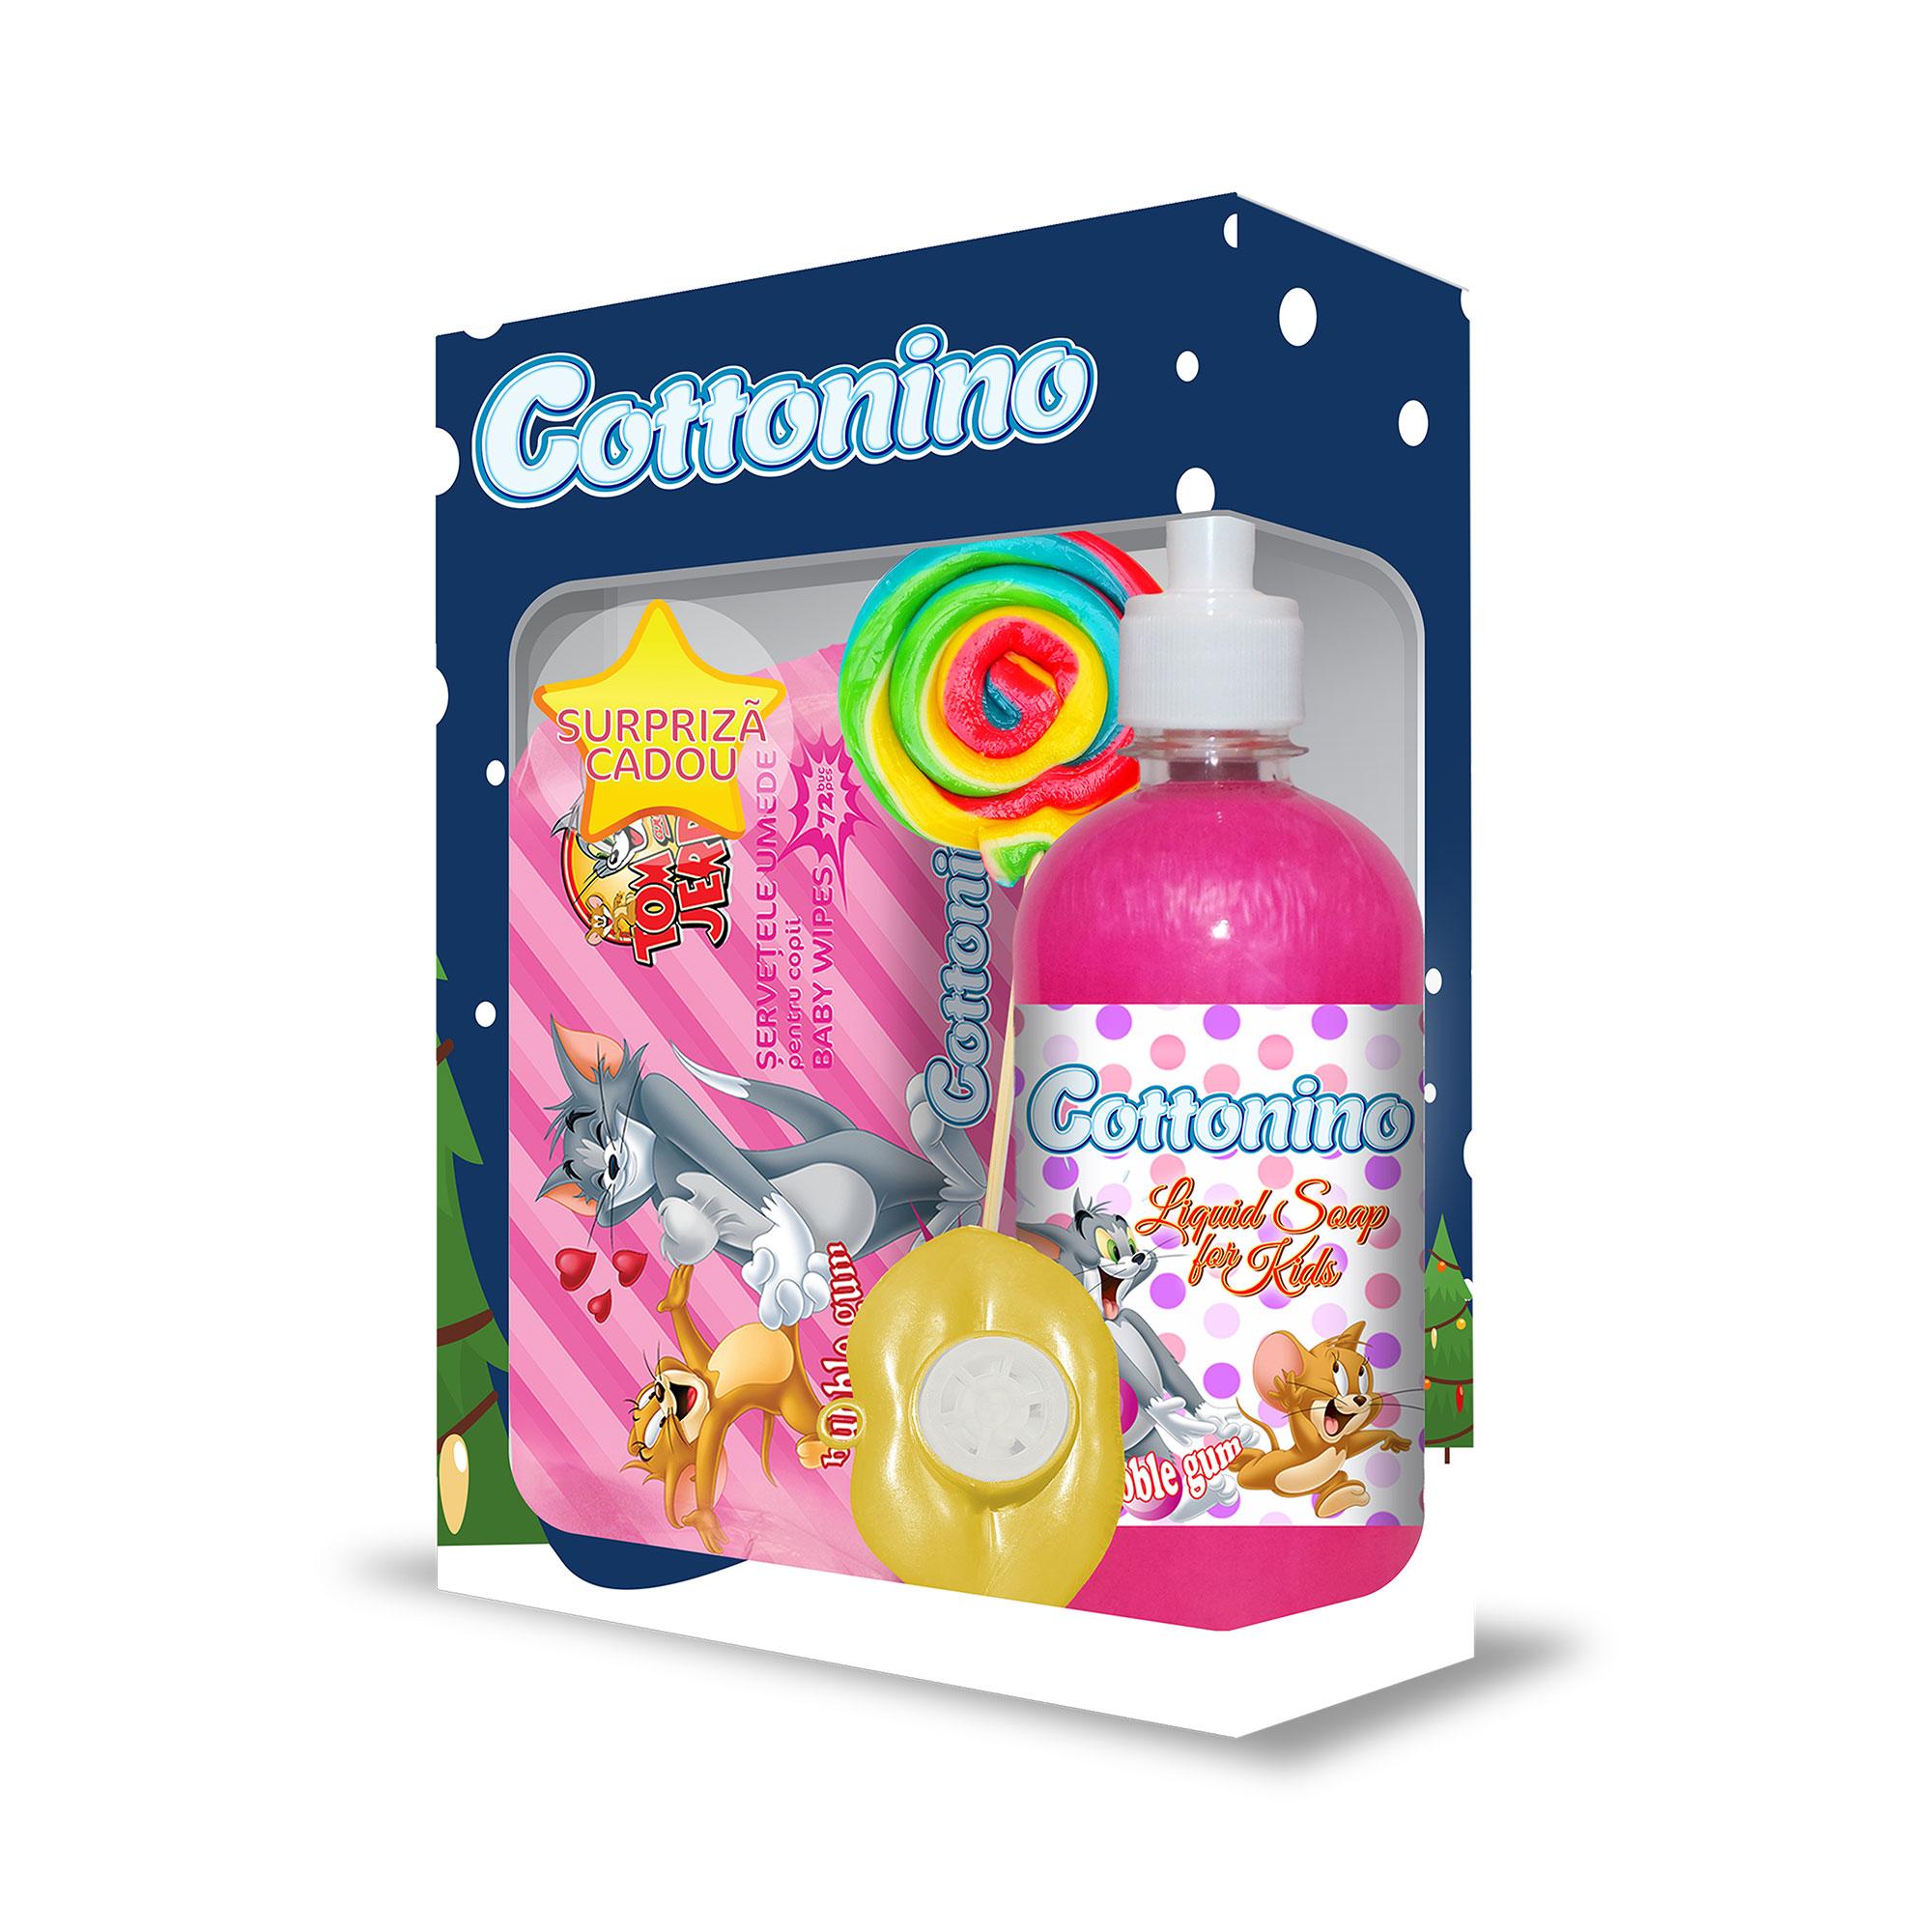 Cottonino Gift Box Tom & Jerry Bubble Gum